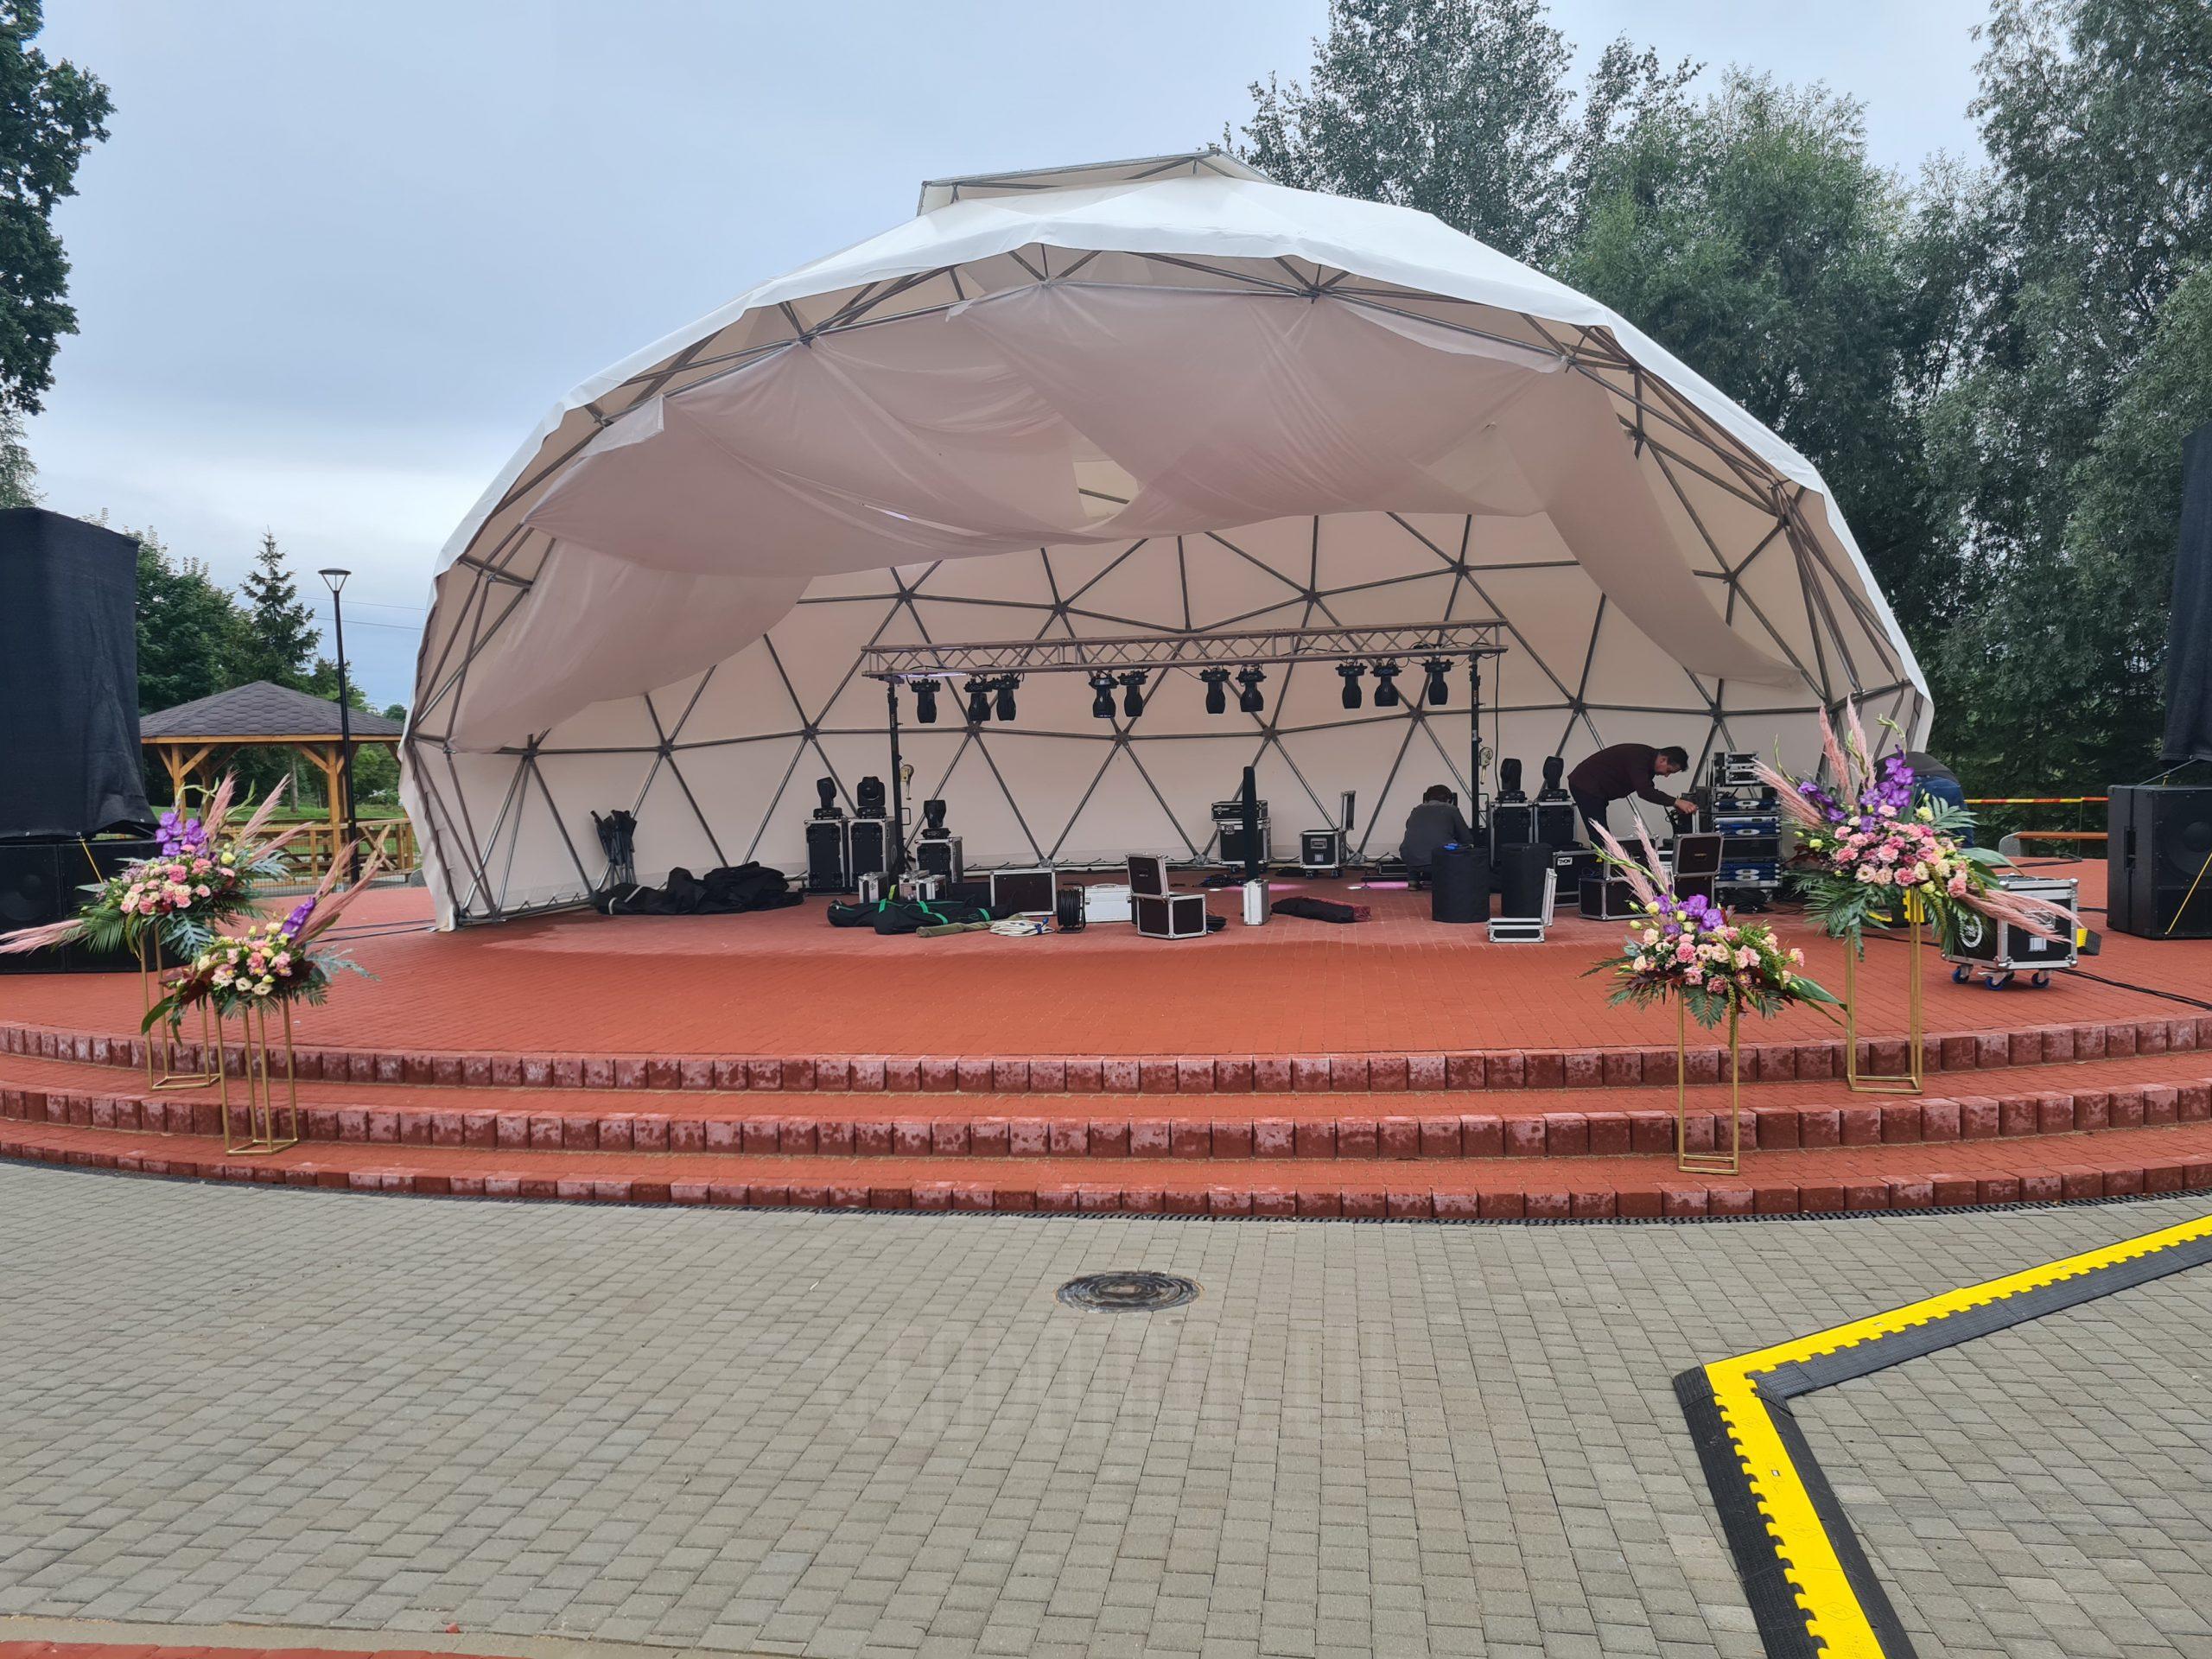 Ø11m Miesto scena renginiams Pilviškėse, Lietuva